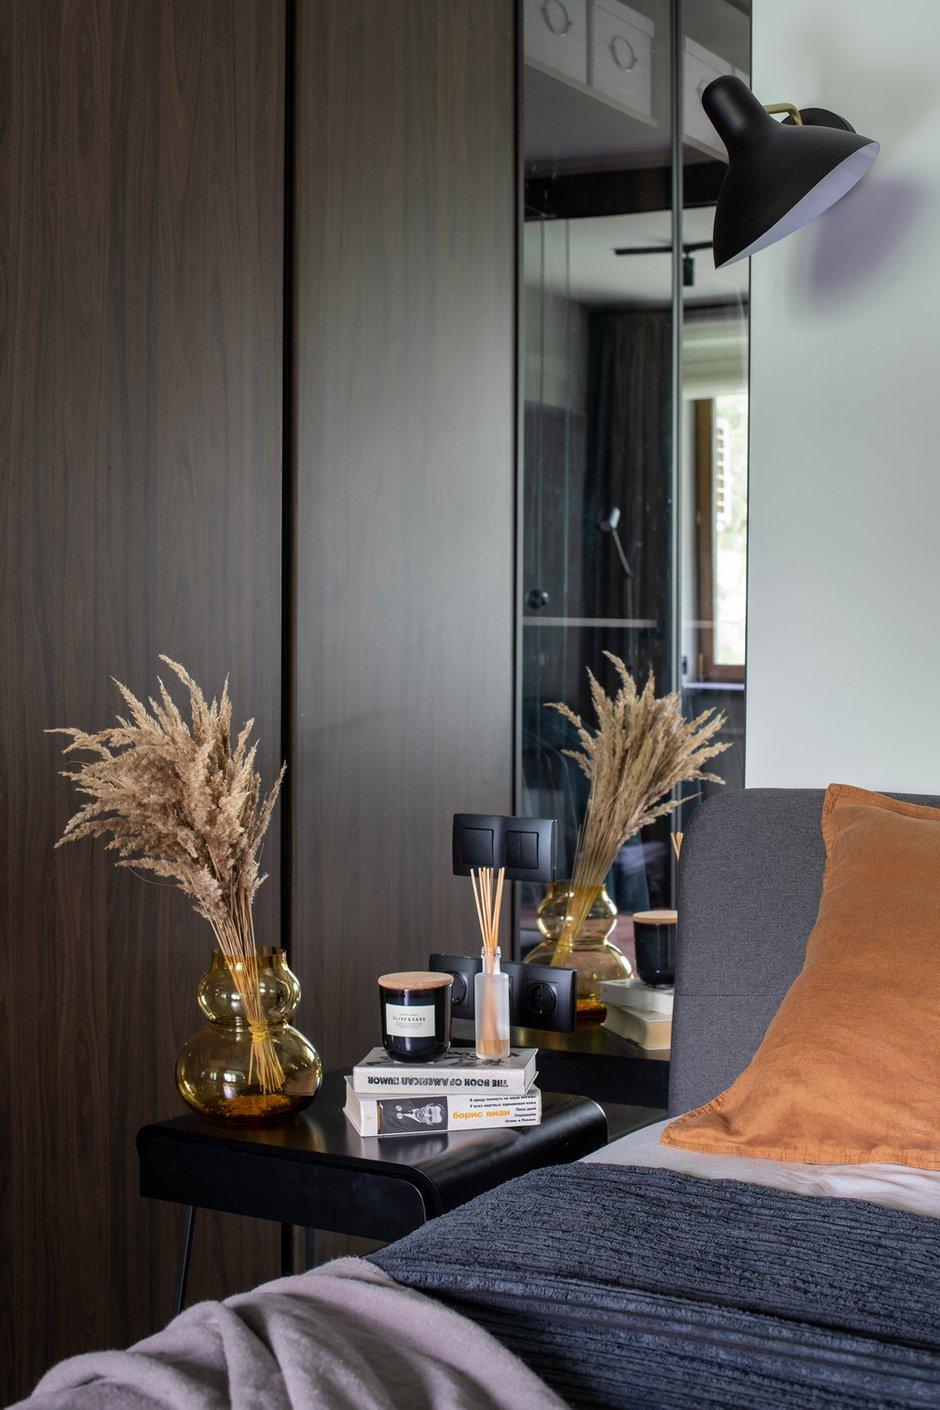 Фотография: Спальня в стиле Современный, Малогабаритная квартира, Квартира, Студия, Проект недели, Москва, Хрущевка, 1 комната, Huge Studio – фото на INMYROOM